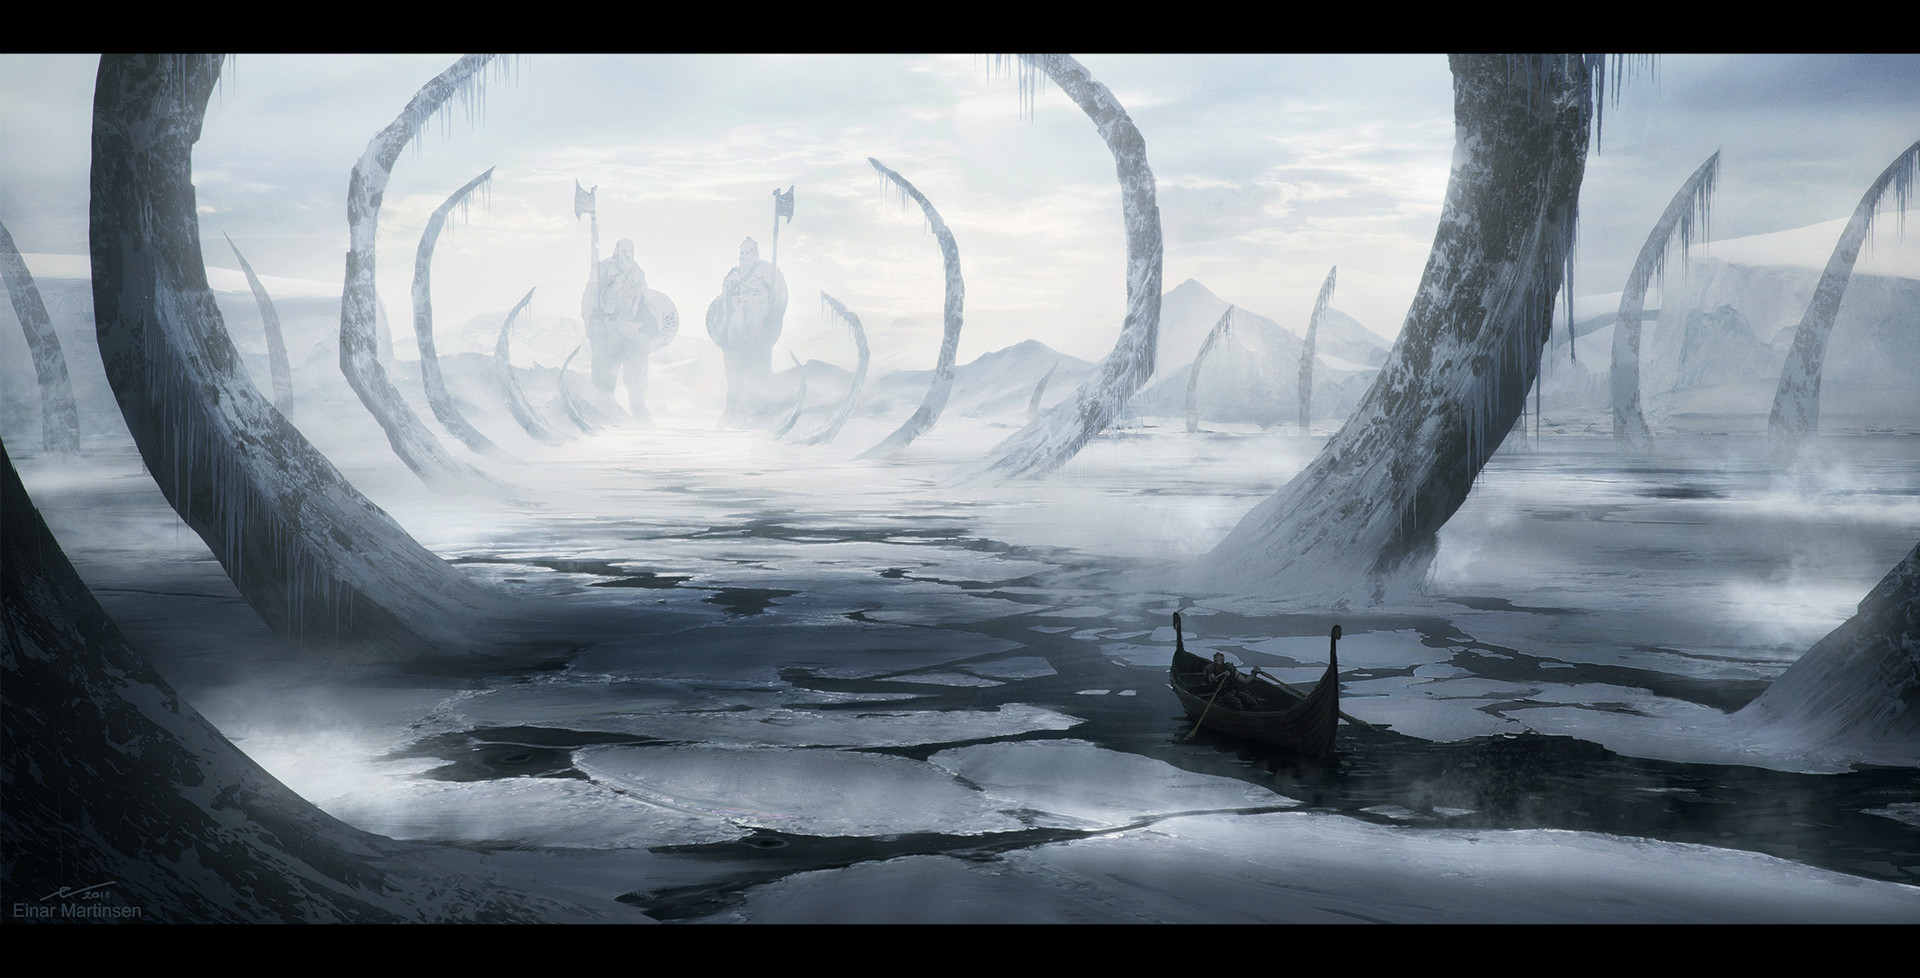 Einar martinsen viking jotunheim gate v01